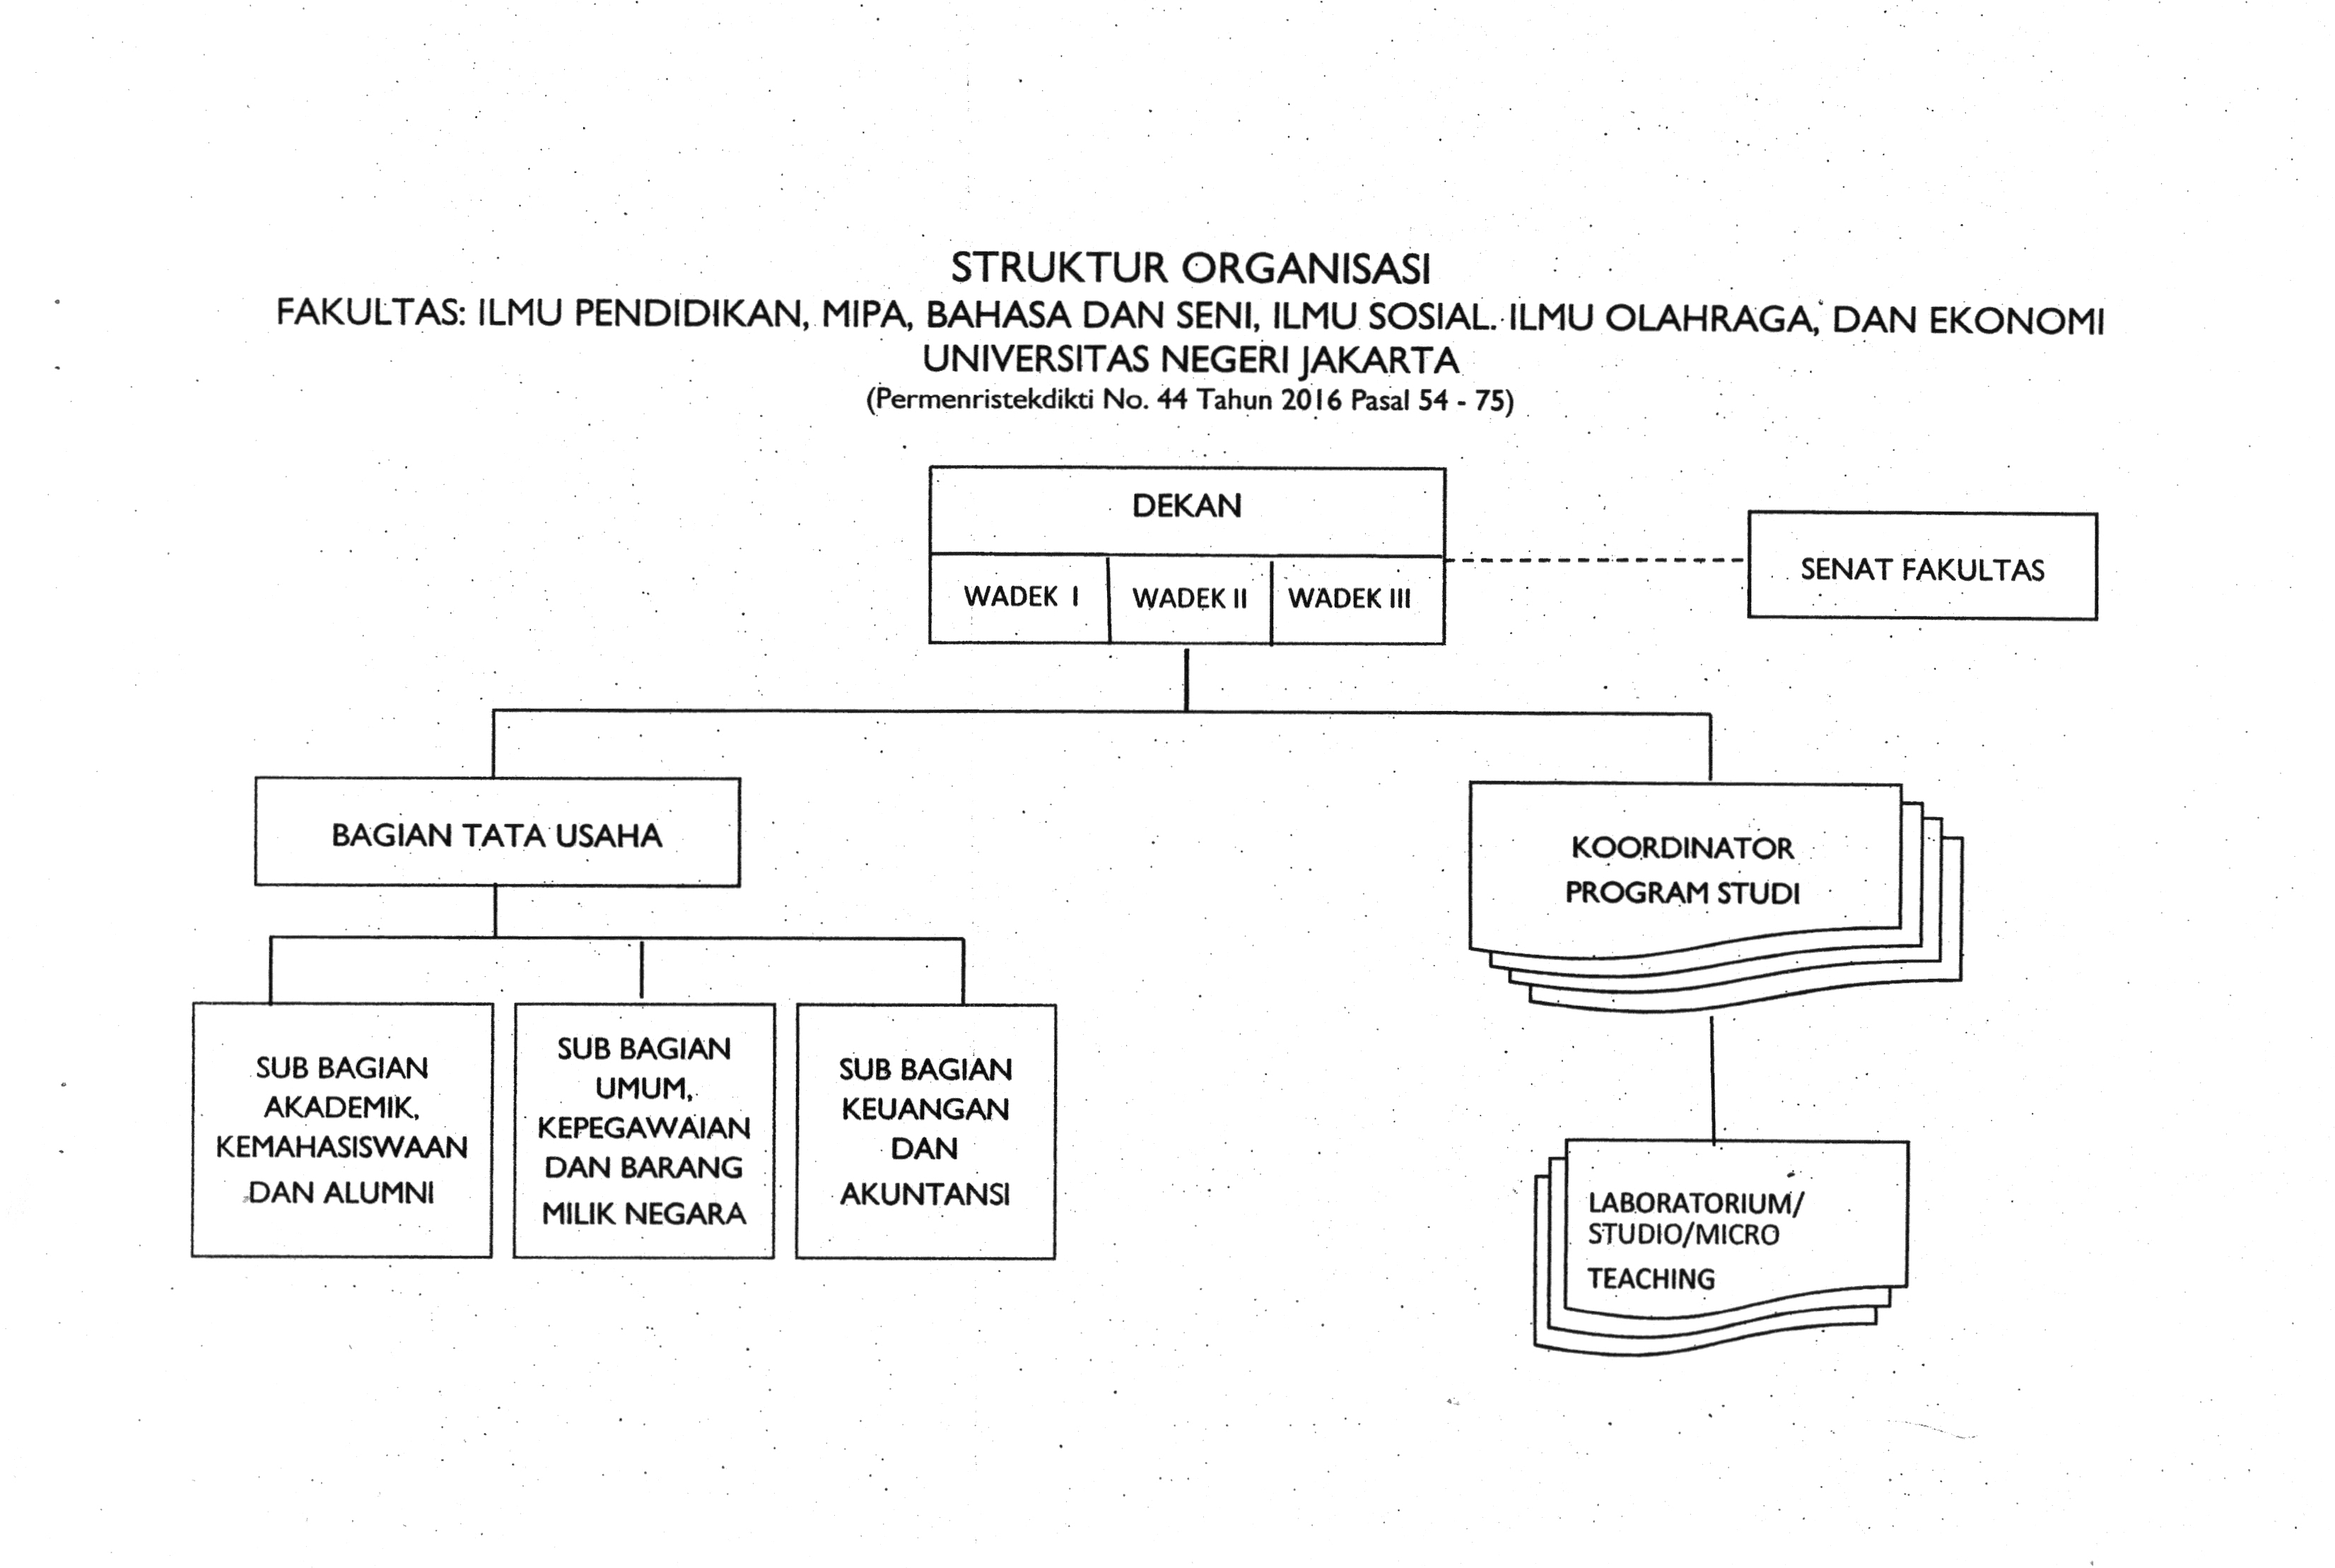 Struktur Organisasi FE 2016